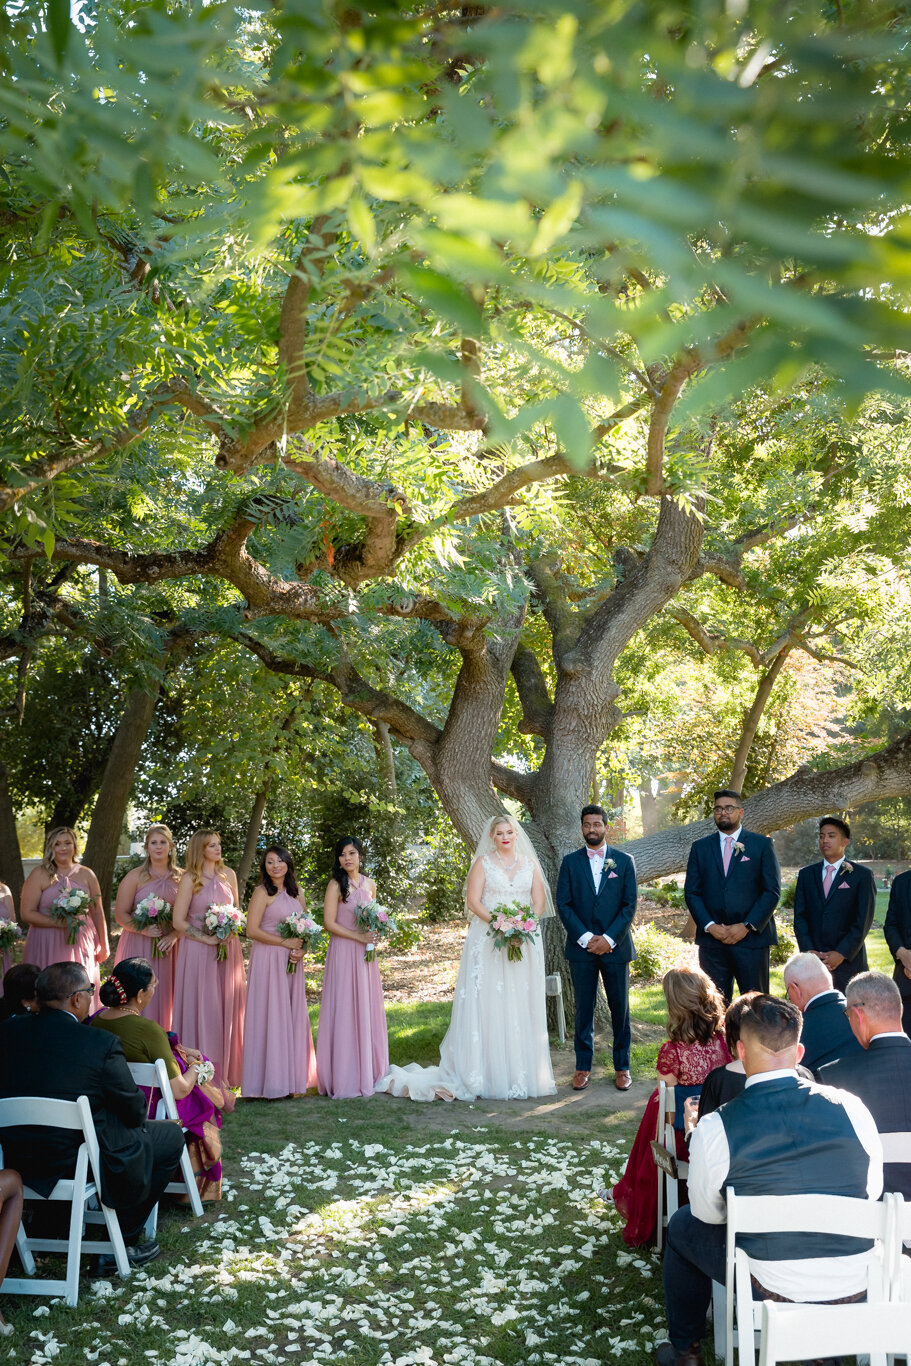 2019.08.24_Emily-Ashir-Wedding-at-the-Maples-5851.jpg